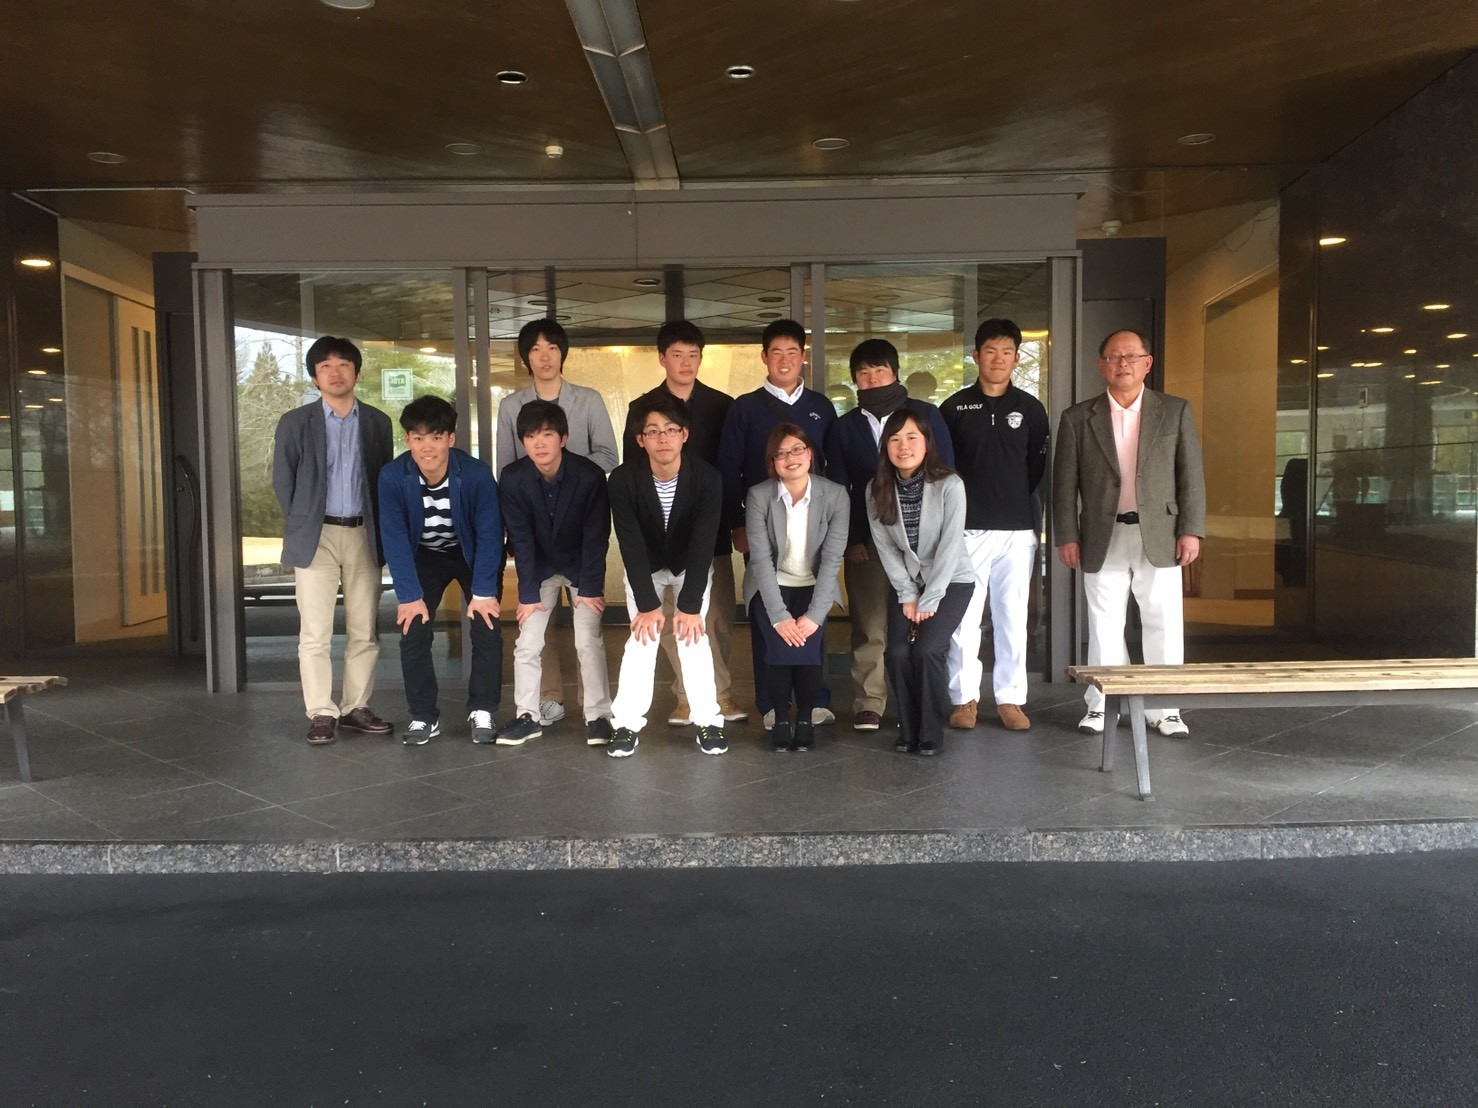 29-1-02ゴルフ部枚方支部同好会(写真).jpg